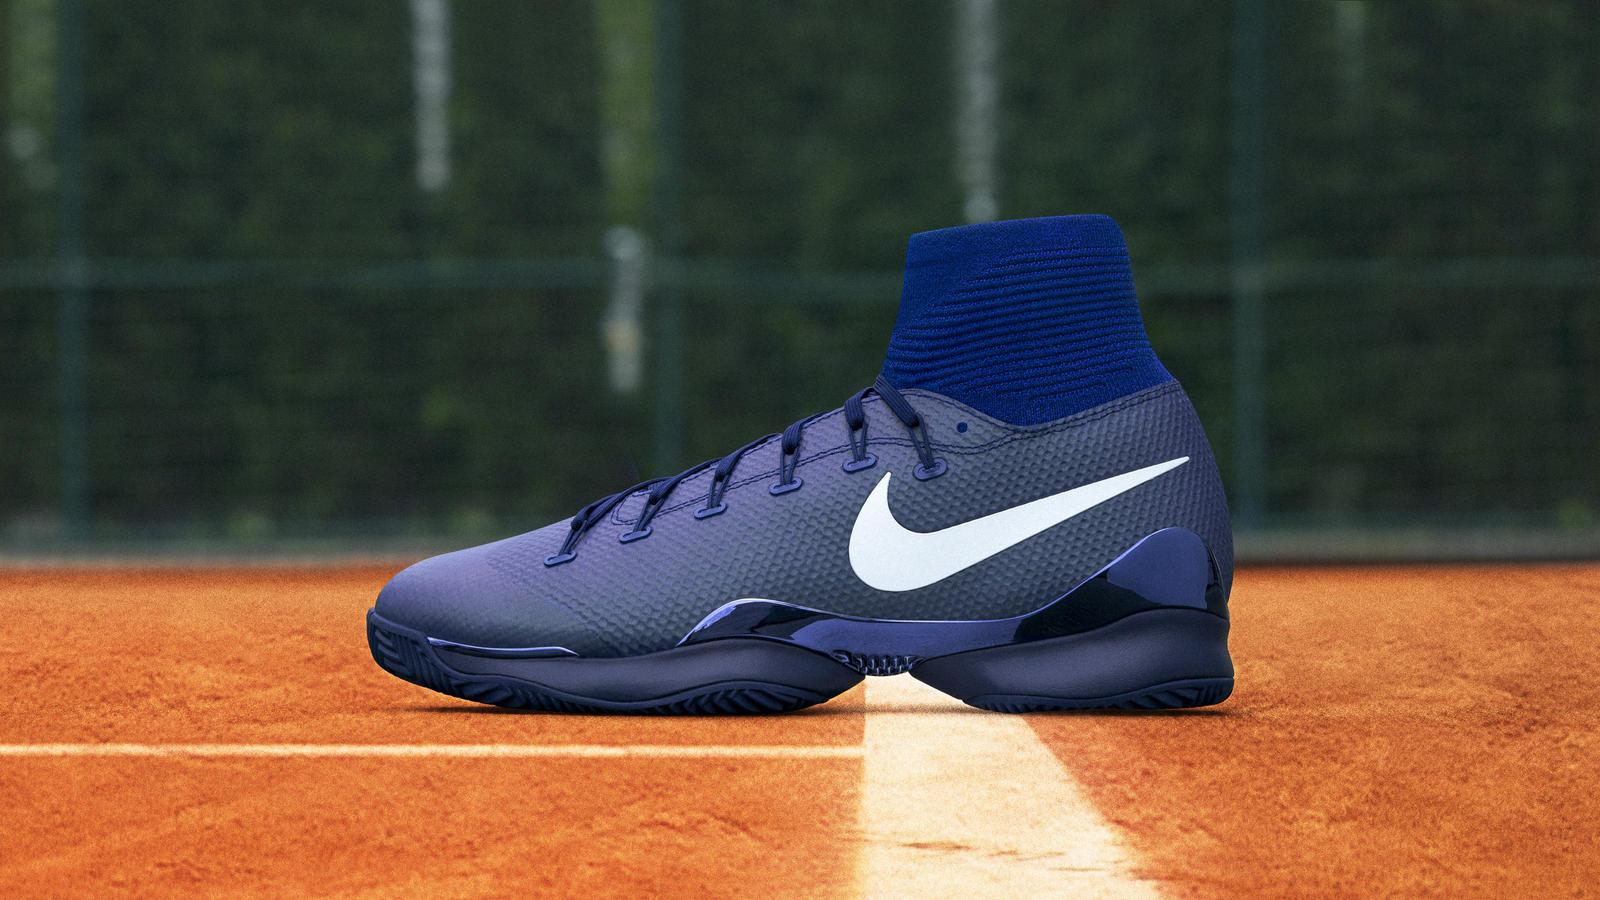 nike tennis_Air_Zoom_Ultrafly_Clay roland garros 2016 tenniscourt shoe